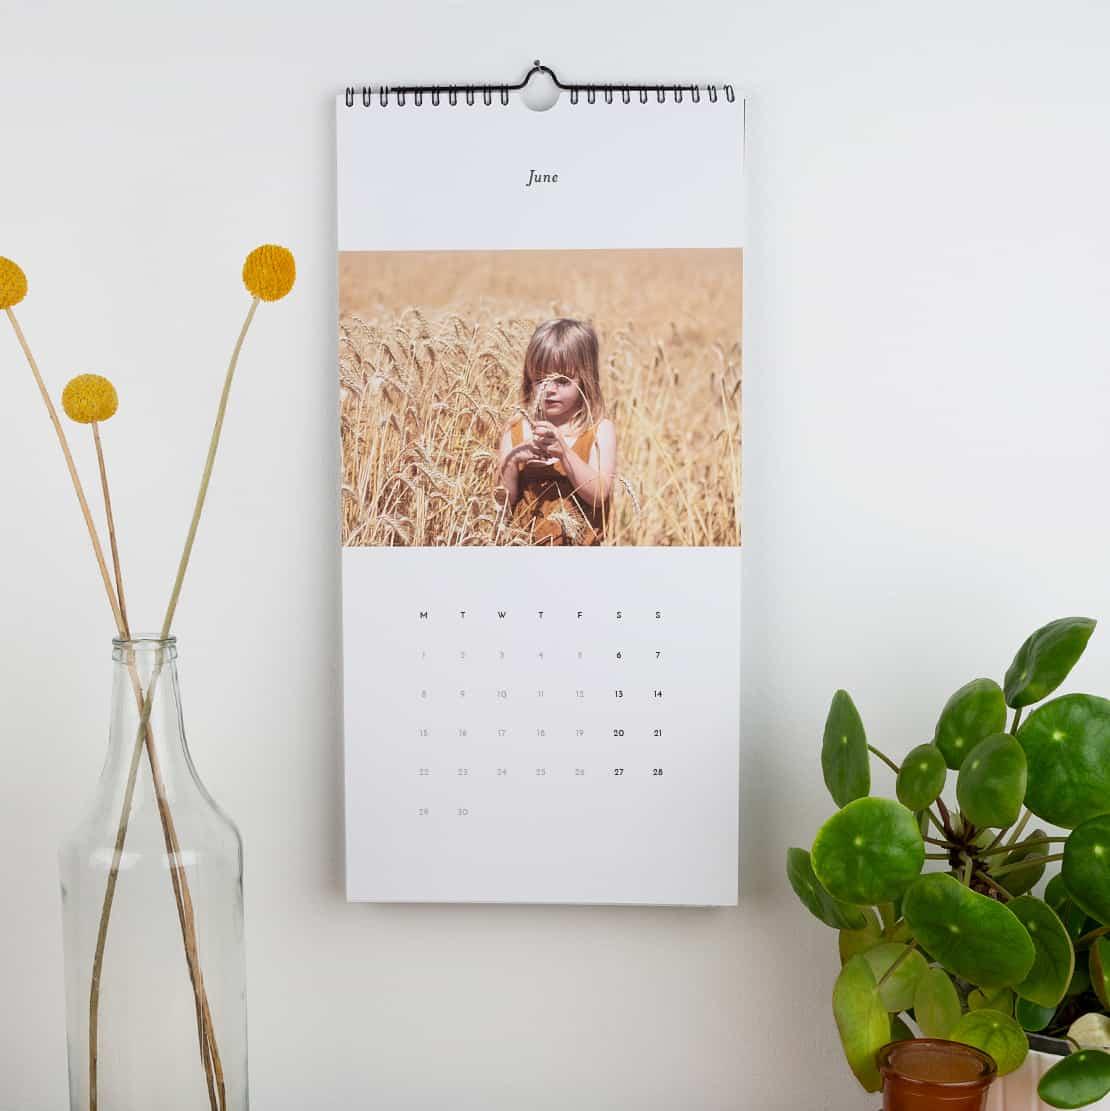 Wall hanging personalised photo calendar from Rosemood